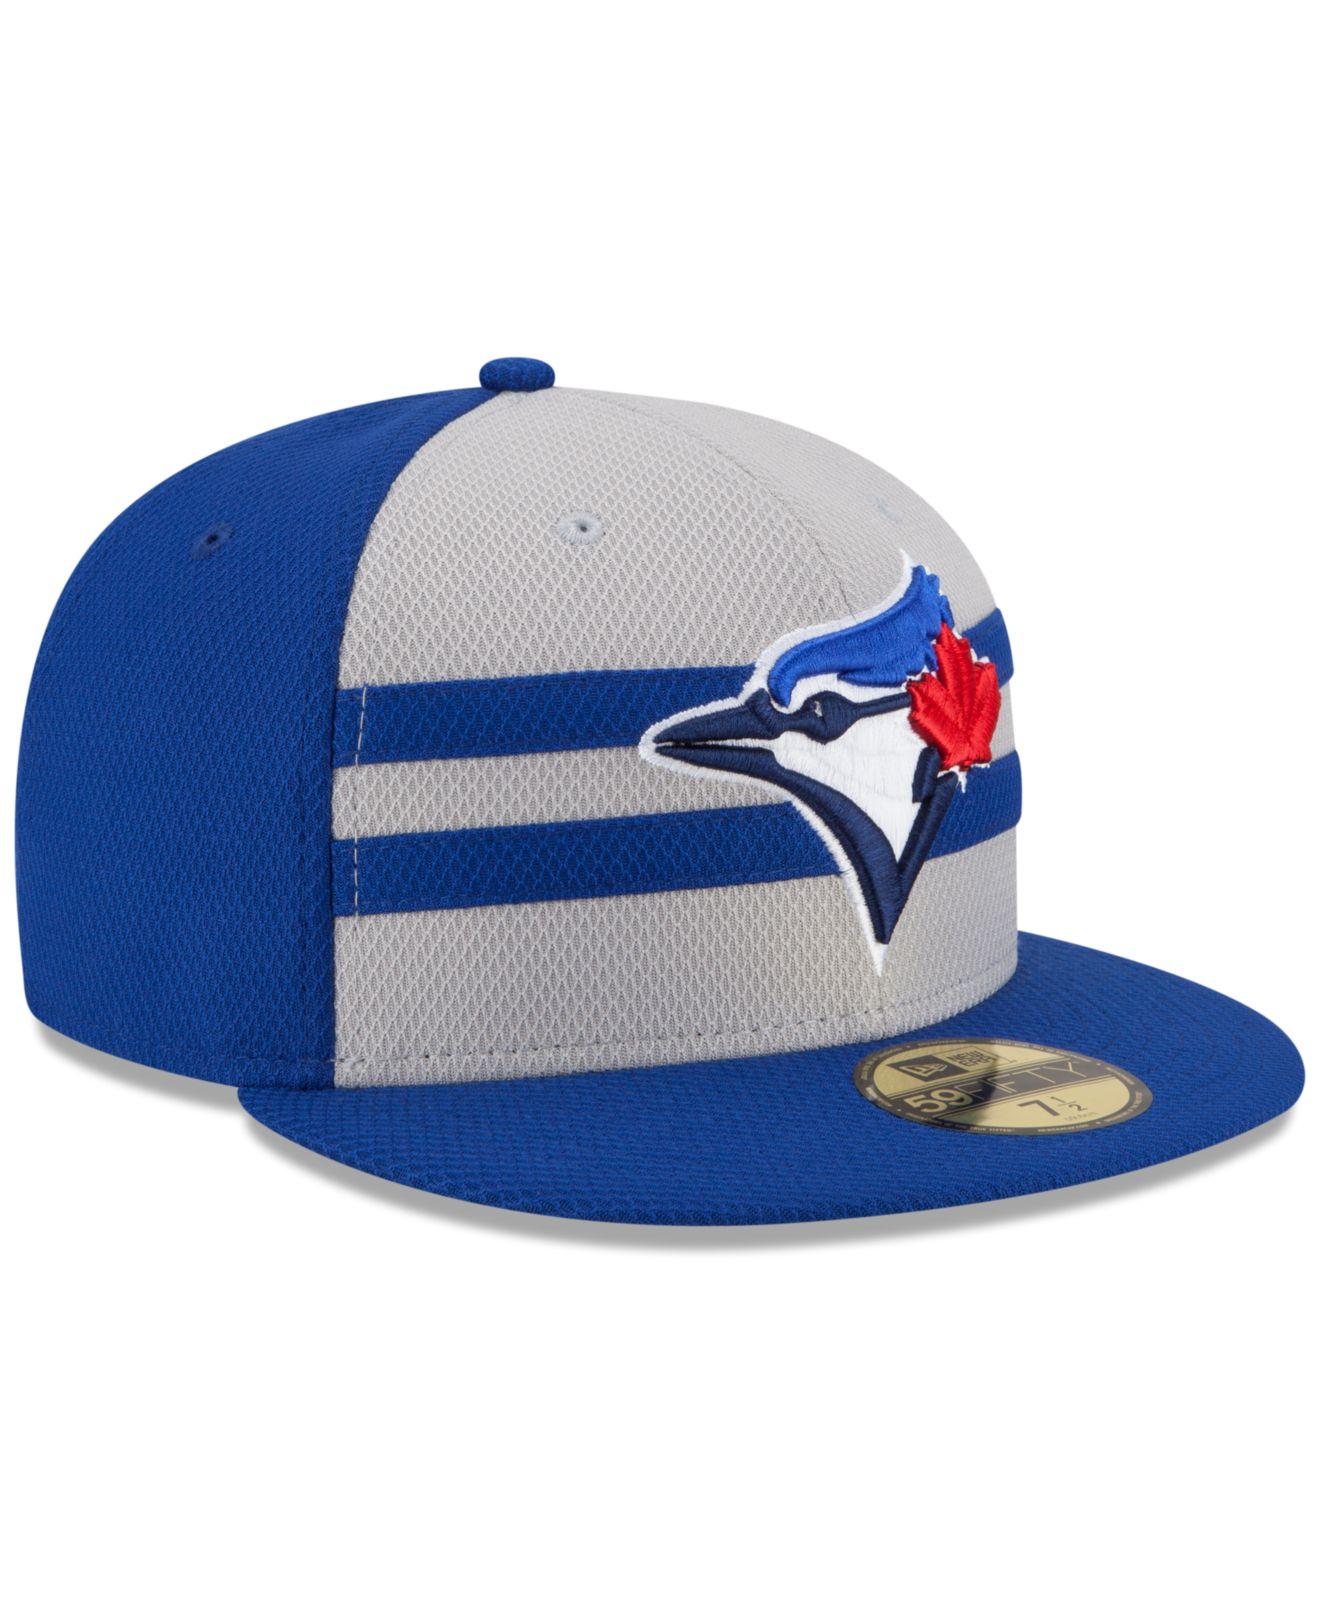 ce0439d6730 ... denmark lyst ktz toronto blue jays 2015 all star game 59fifty cap in  blue 89fe3 ad322